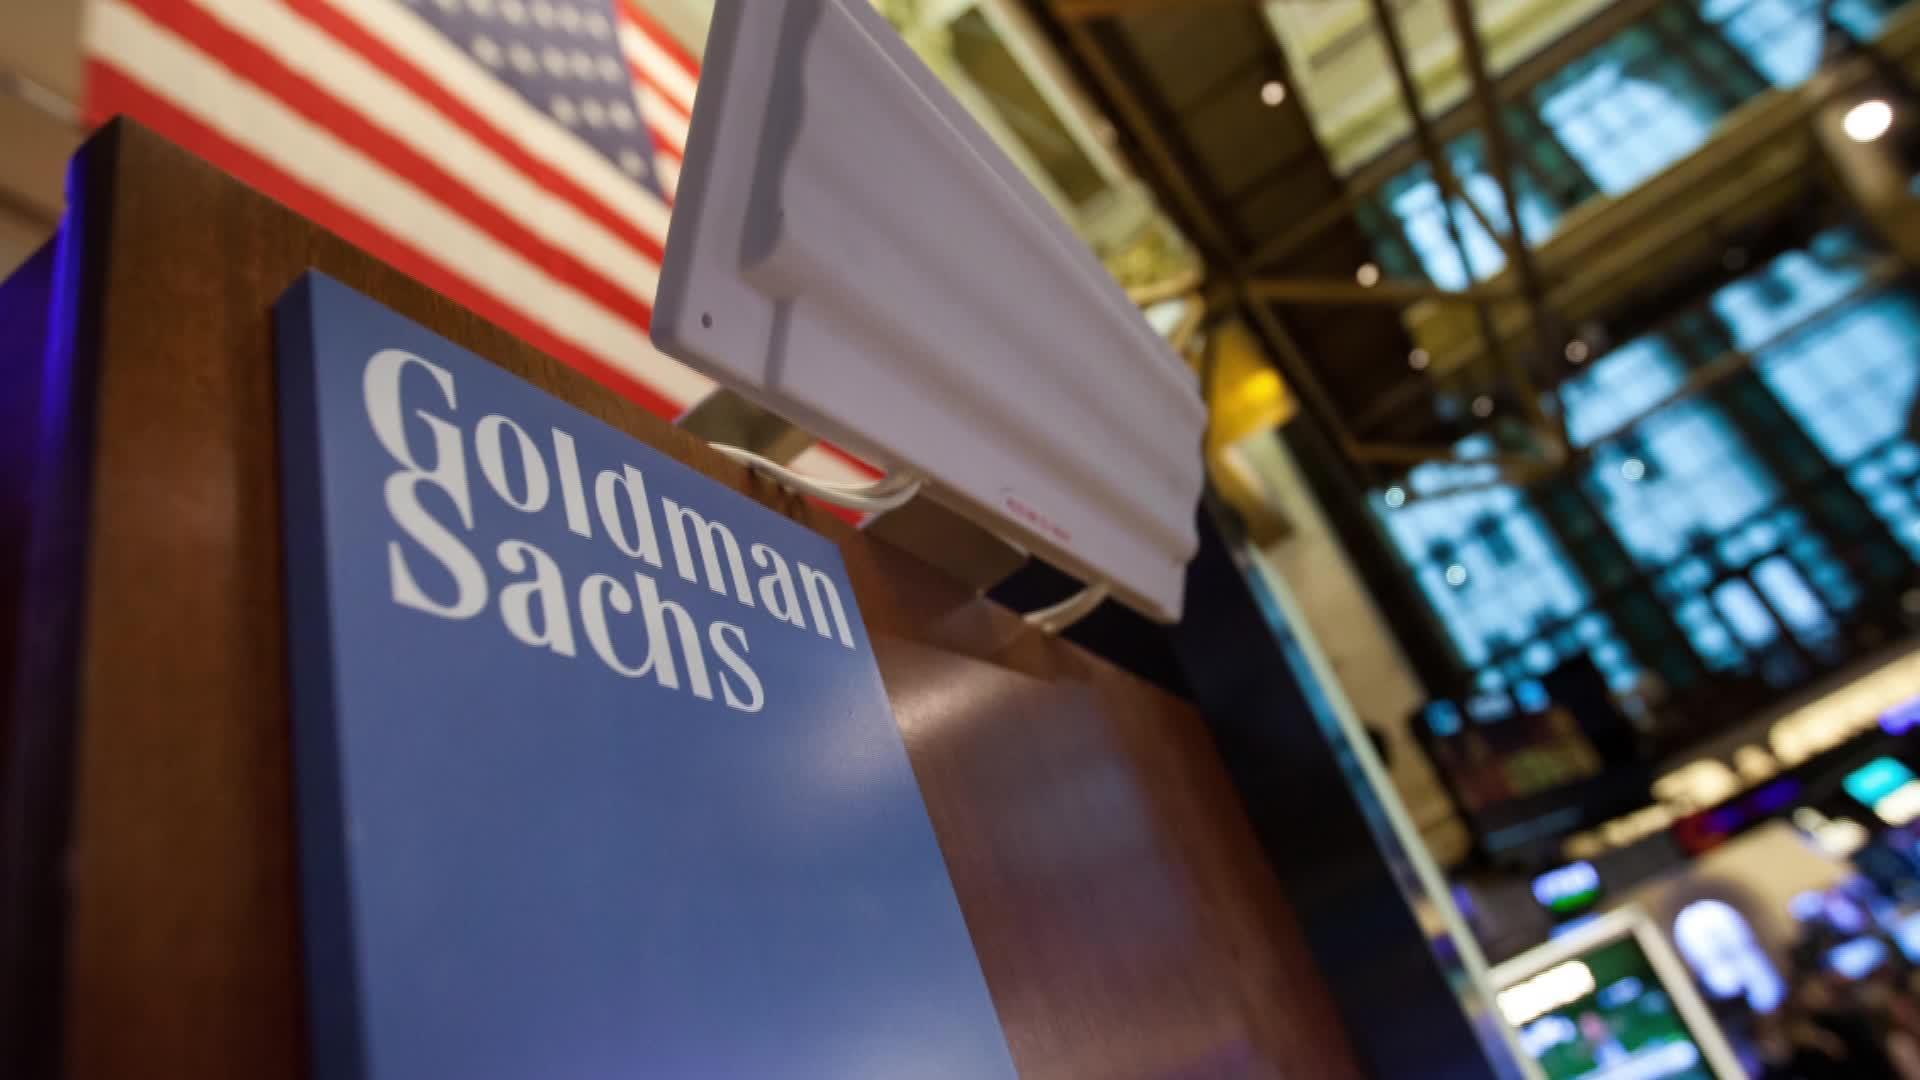 goldman sachs prekybininkas)